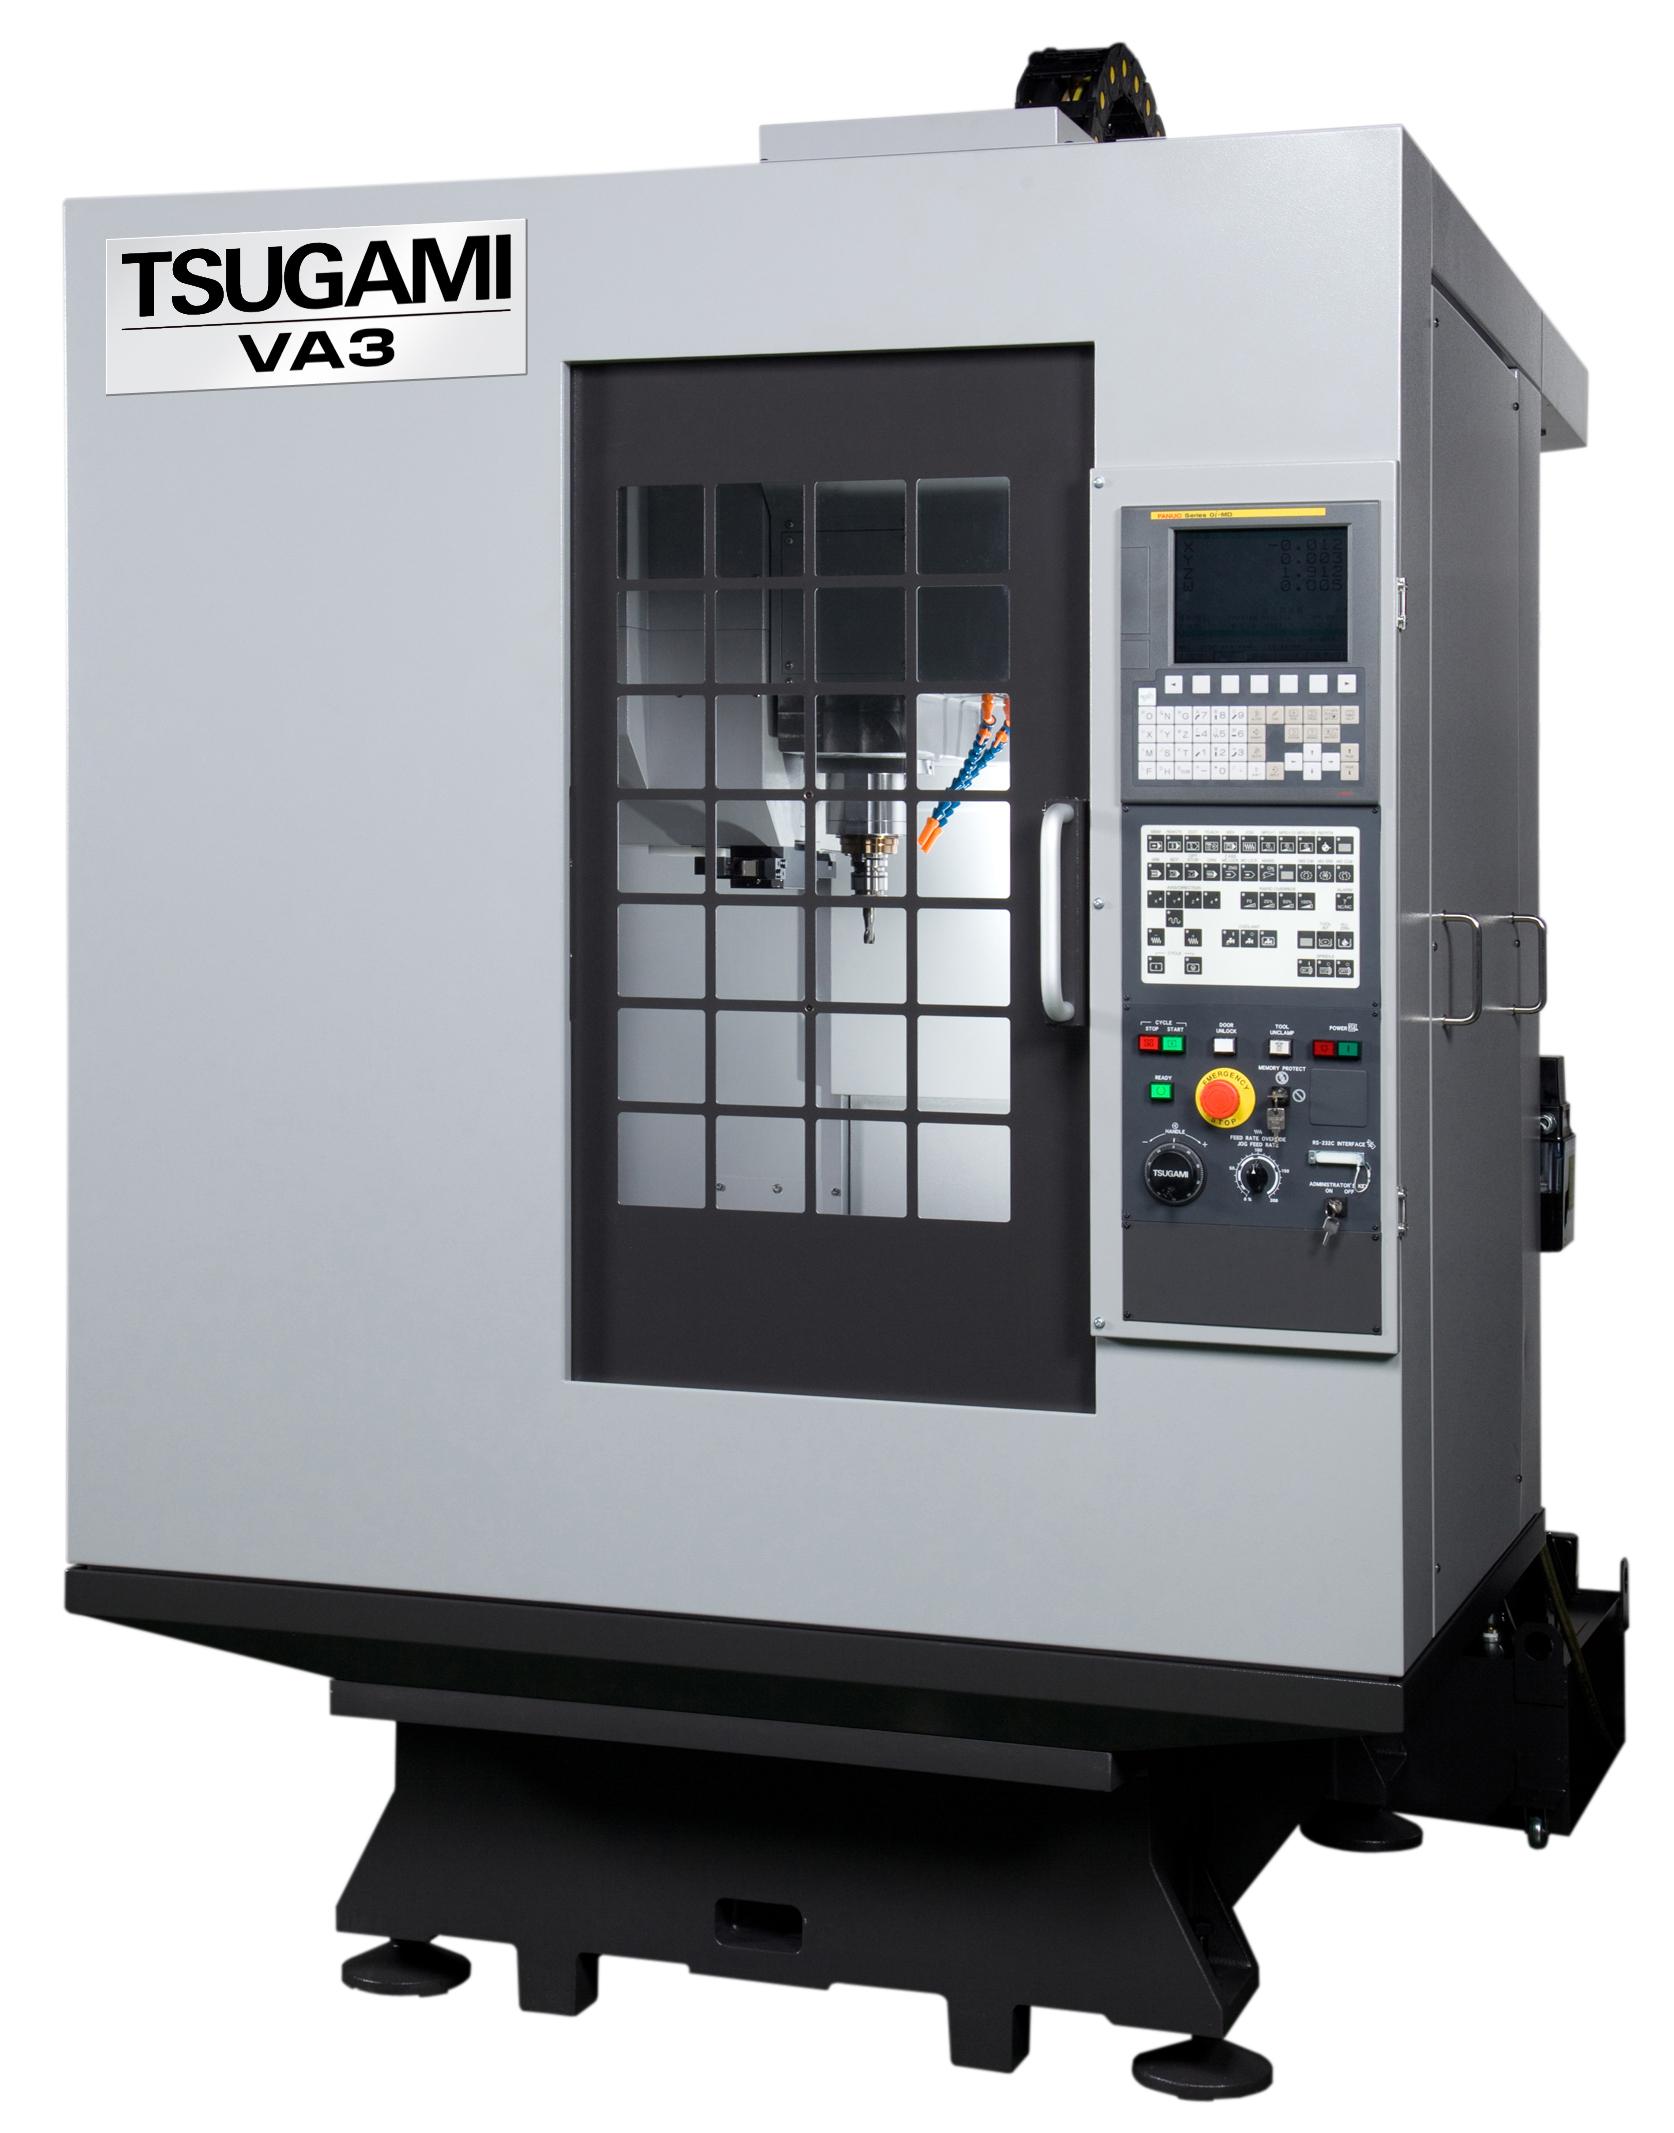 tsugami va3: cnc high speed machining center